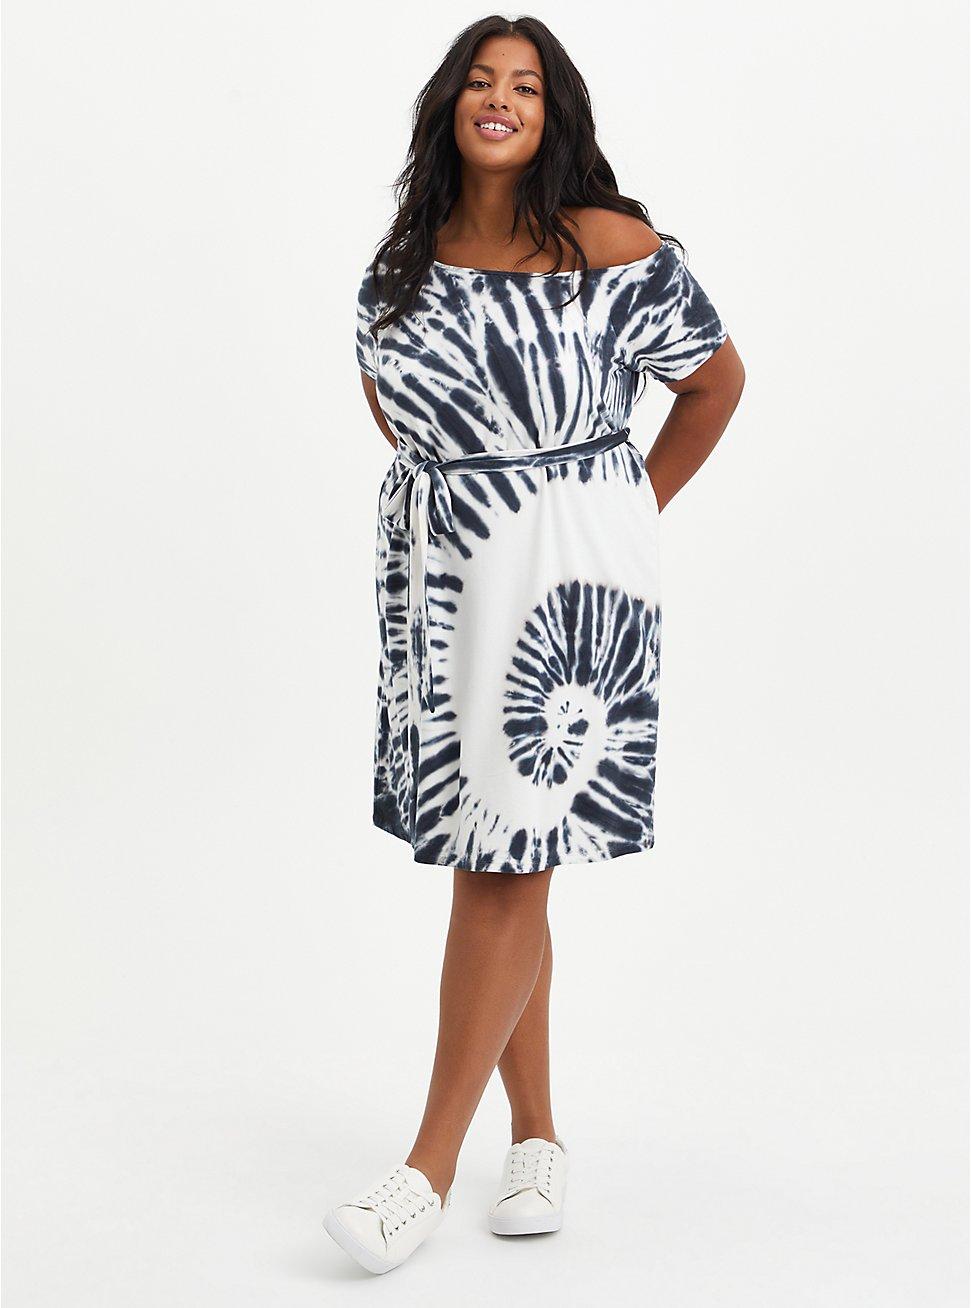 Black Tie Dye Off-Shoulder French Terry T-Shirt Dress, TIE DYE-BLACK, hi-res